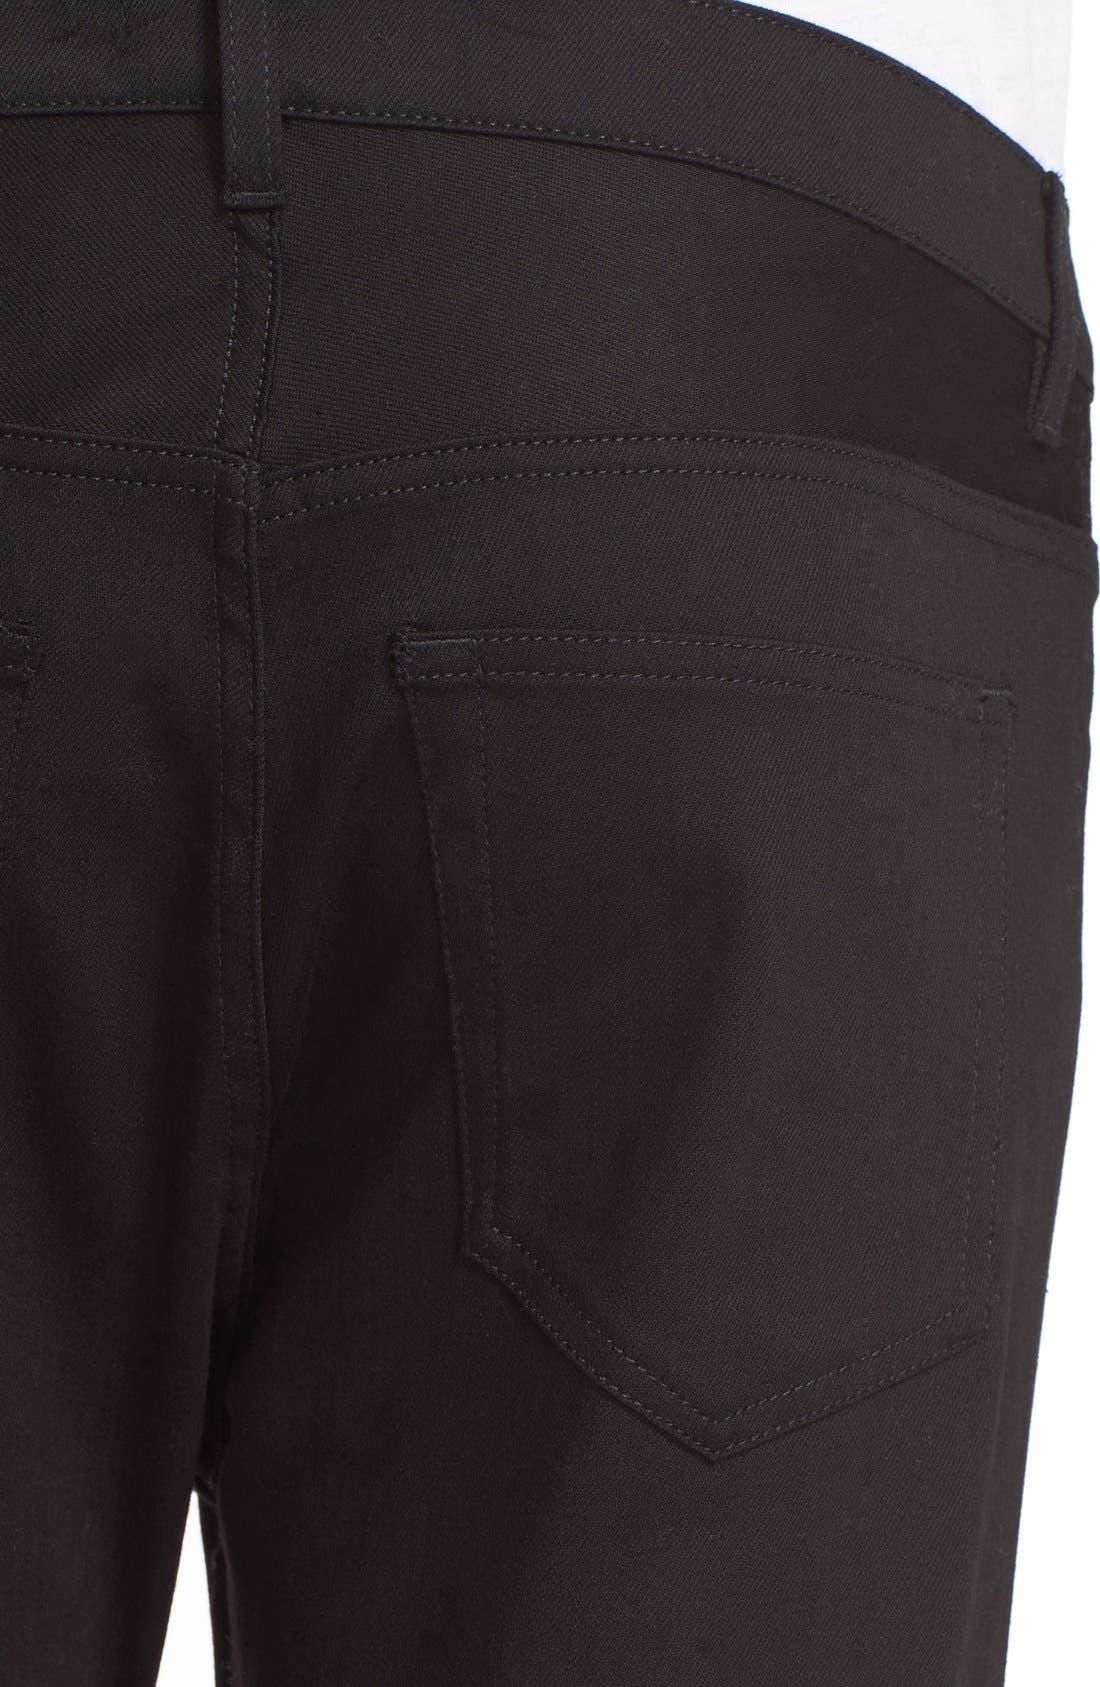 ACNE STUDIOS,                             Town Straight Leg Jeans,                             Alternate thumbnail 4, color,                             001